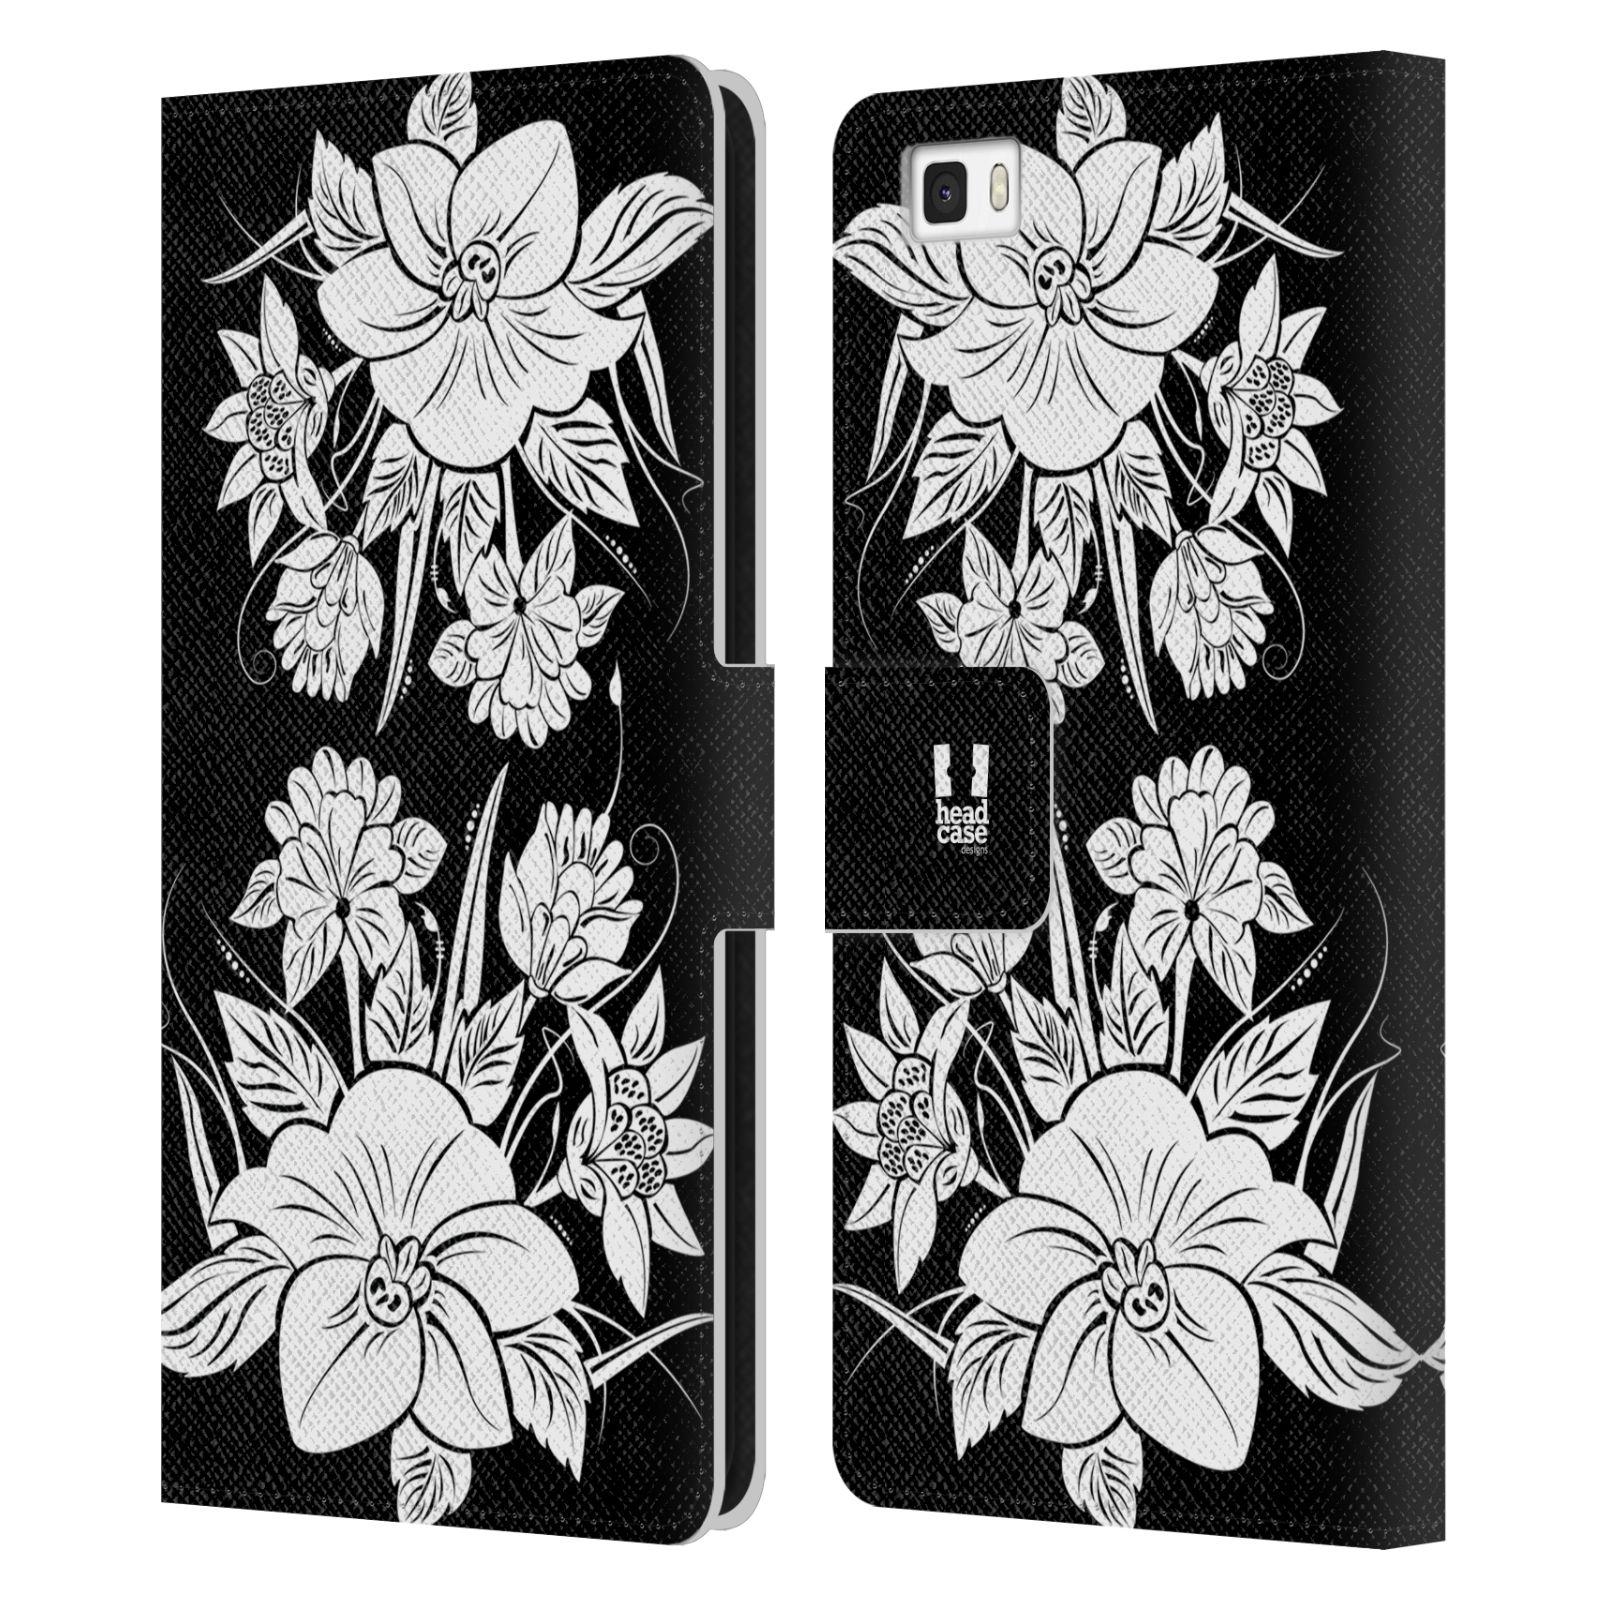 HEAD CASE Flipové pouzdro pro mobil Huawei P8 LITE ČERNOBÍLÁ KVĚTINA pohádková zahrada